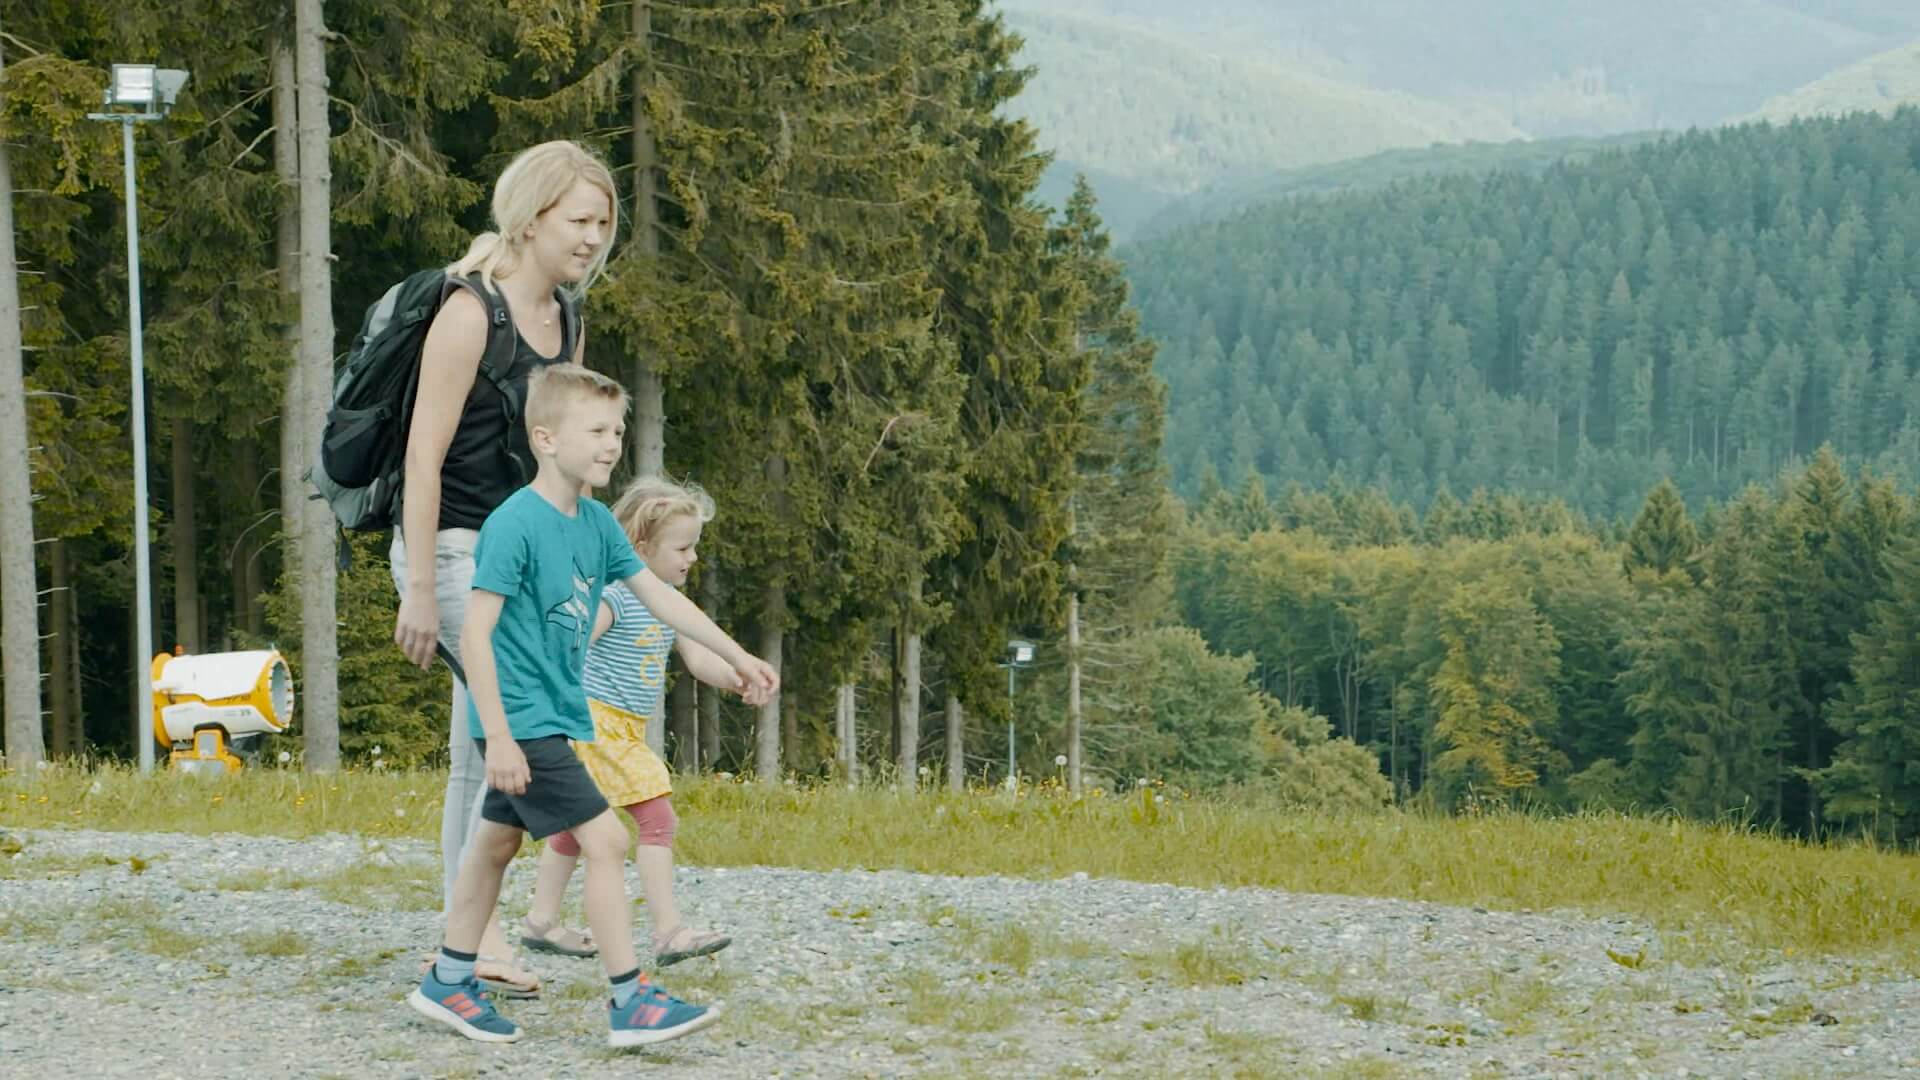 Familie im Grünen am Erlebnisberg Kappe Winterberg